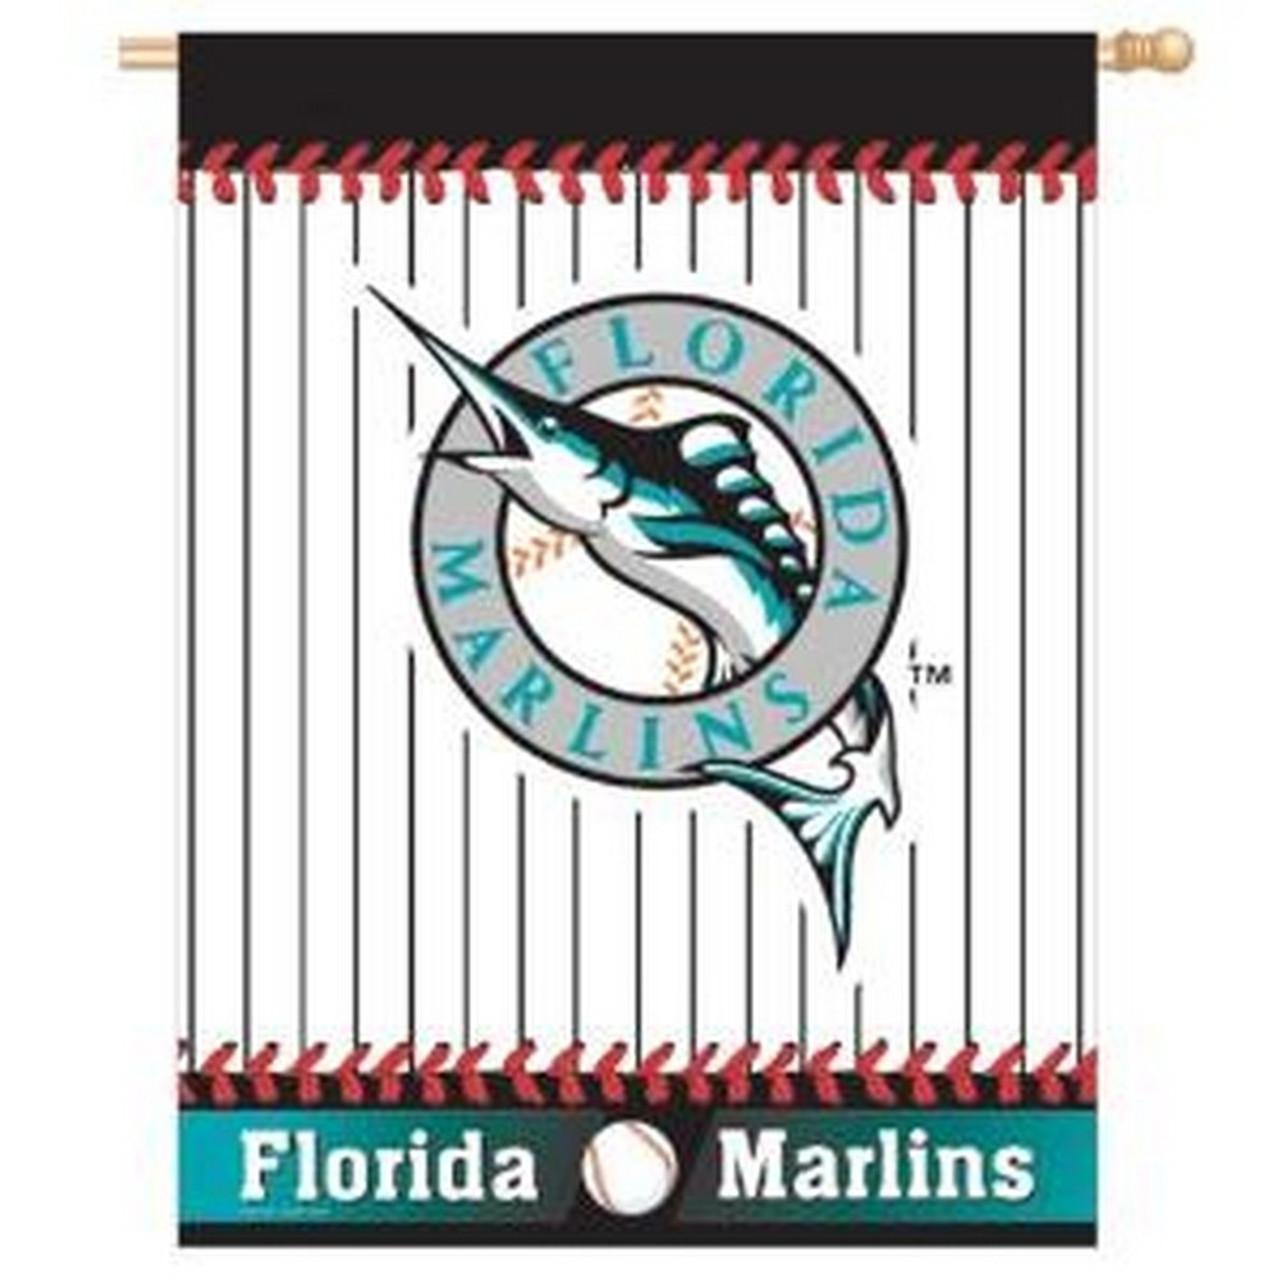 Florida Marlins Vertical Outdoor House Flag